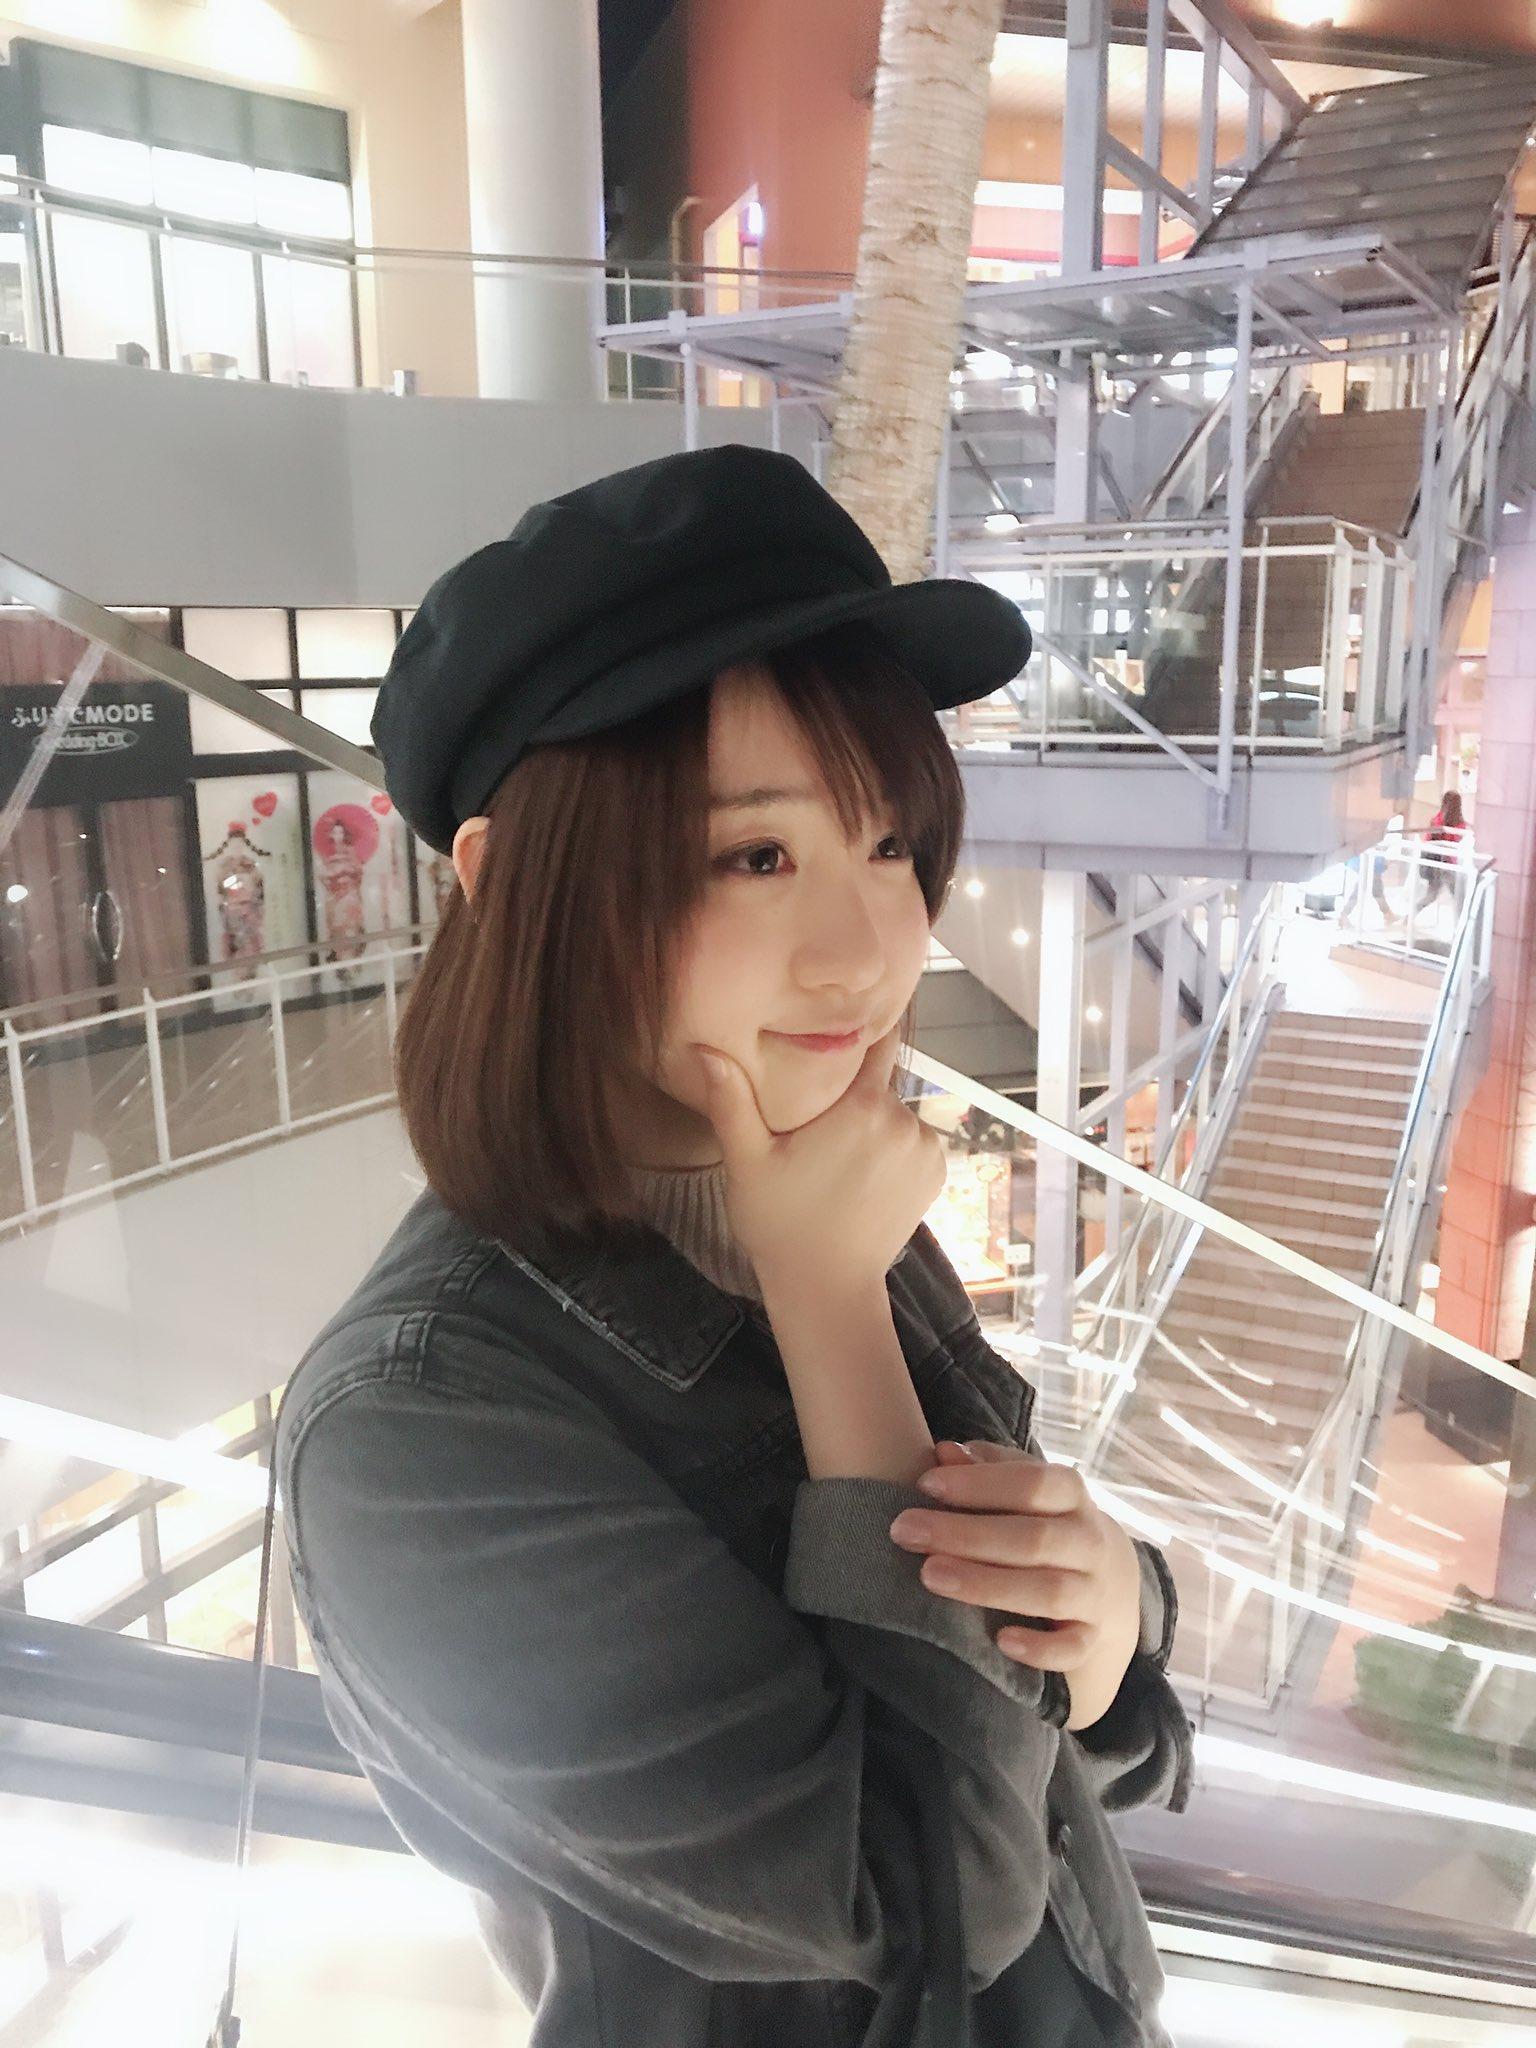 童颜巨乳COSER小姐姐yami推特图集 Yami-twitter7(5)